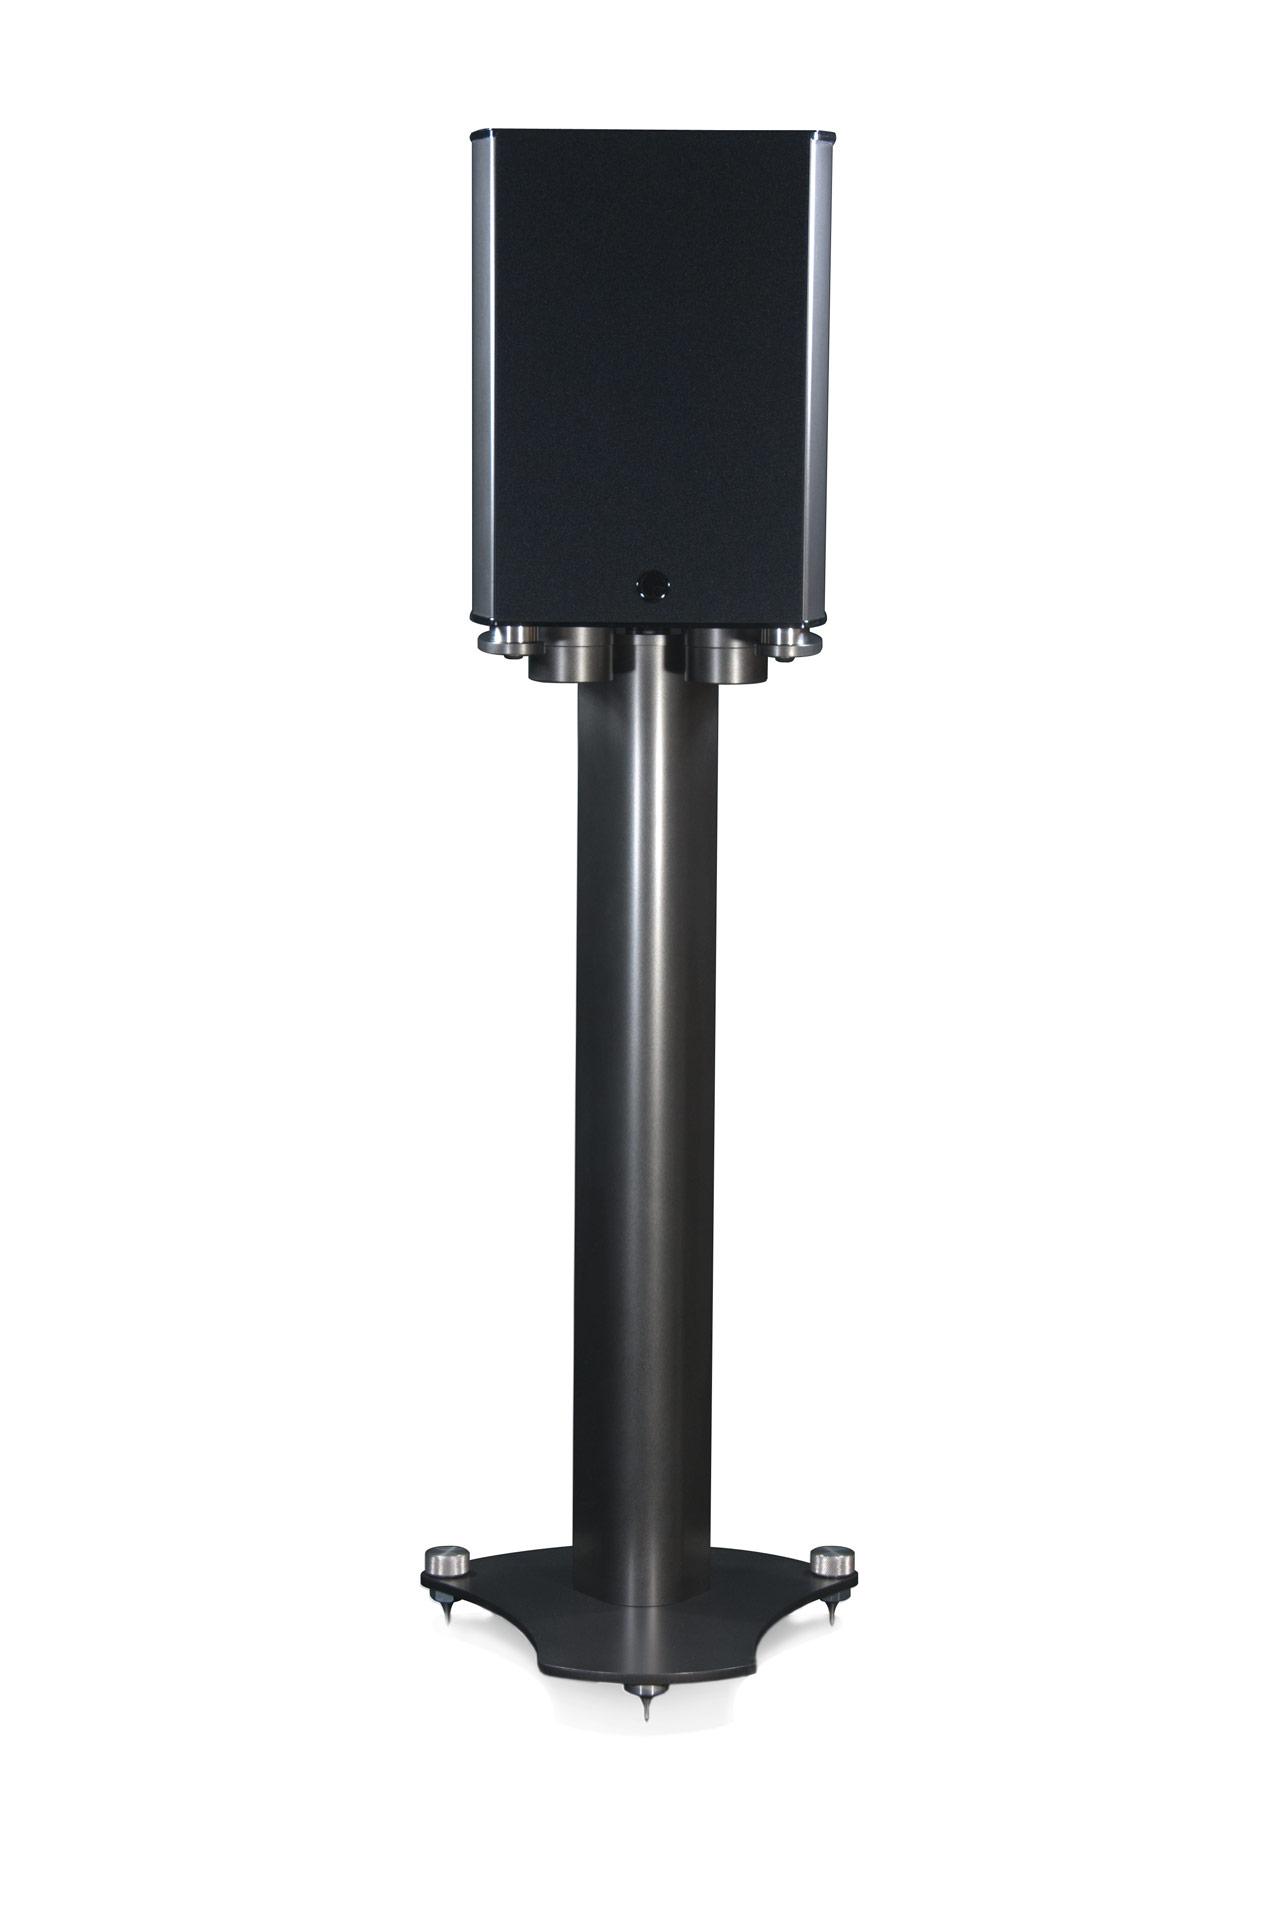 Wilson Benesch Geometry Series Vertex Standmount loudspeaker Singularity Audio